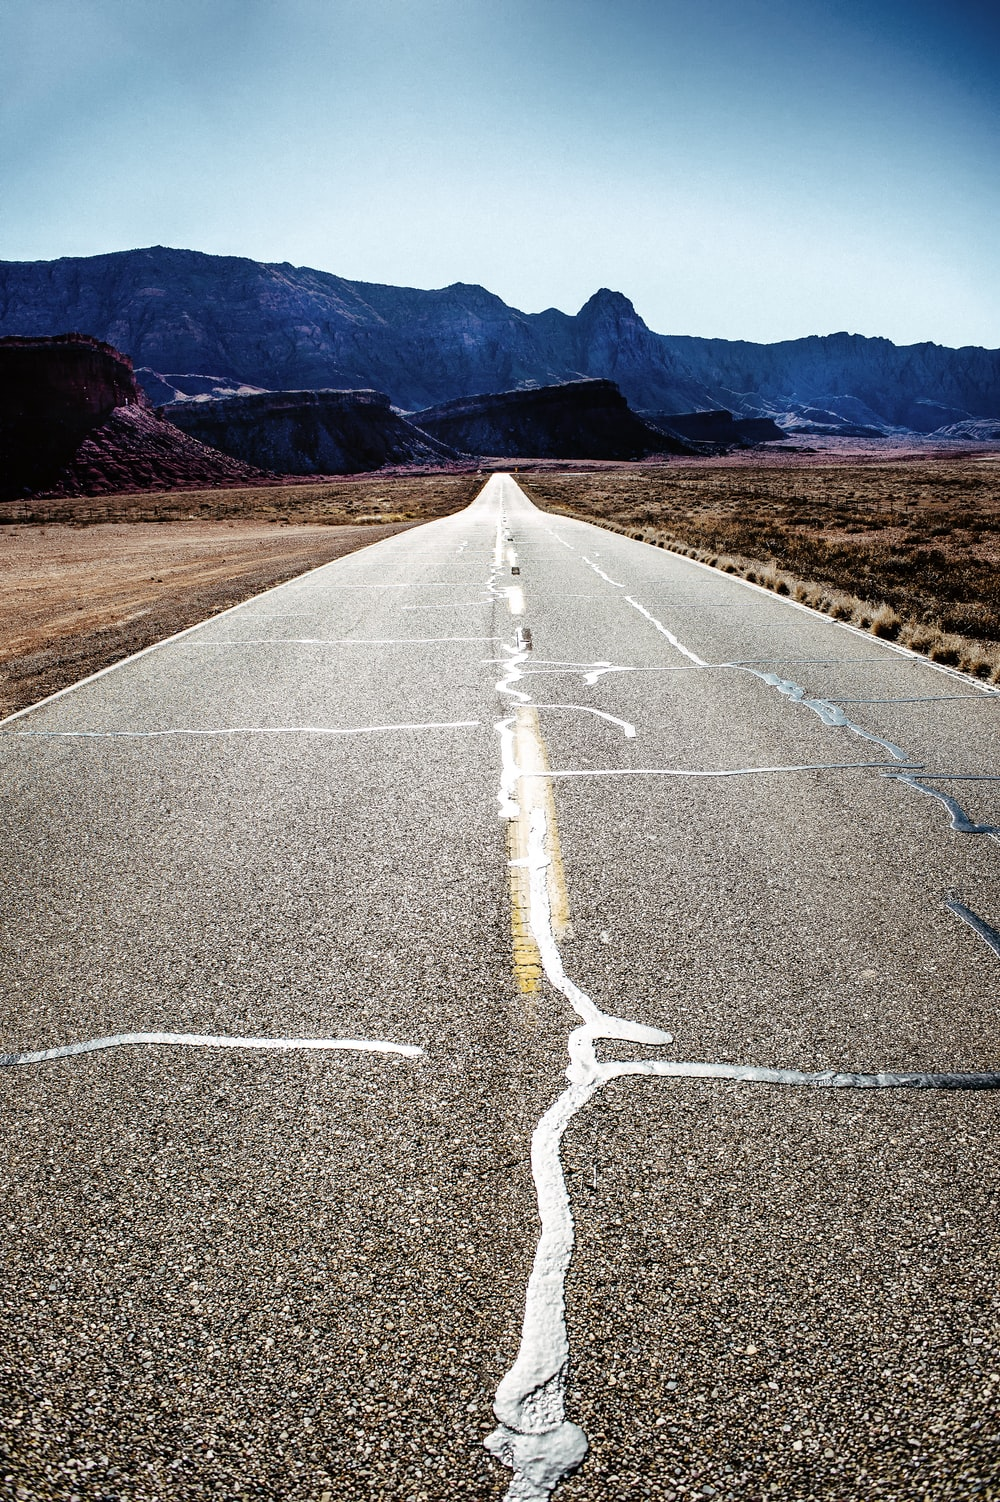 arizona 1031 exchange road,delay taxes forever